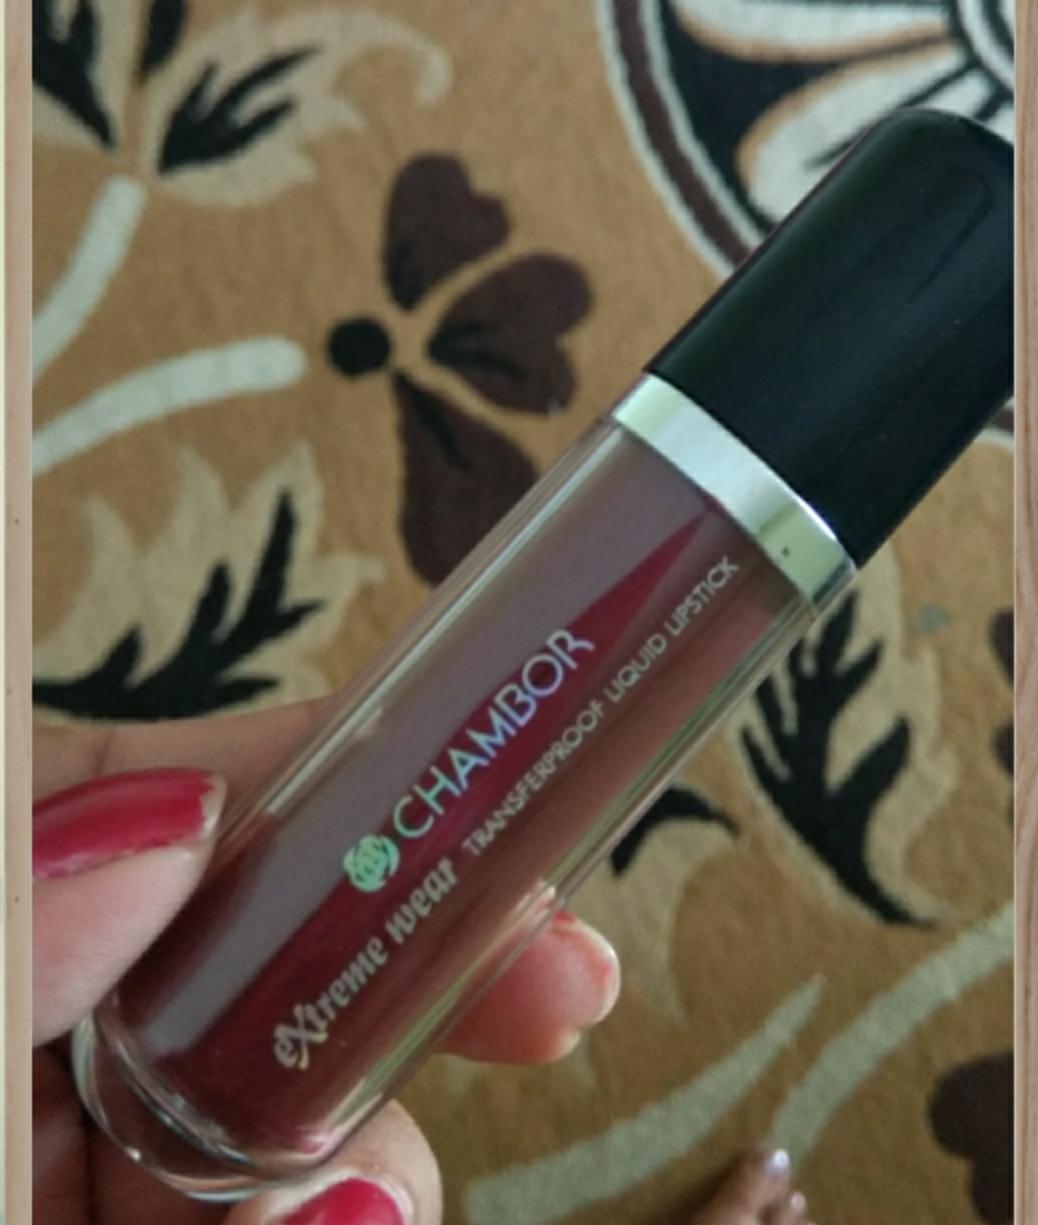 Chambor Extreme Wear Transferproof Liquid Lipstick-Long Lasting Creamy Matte Liquid Lipstick-By ankita_agarwal